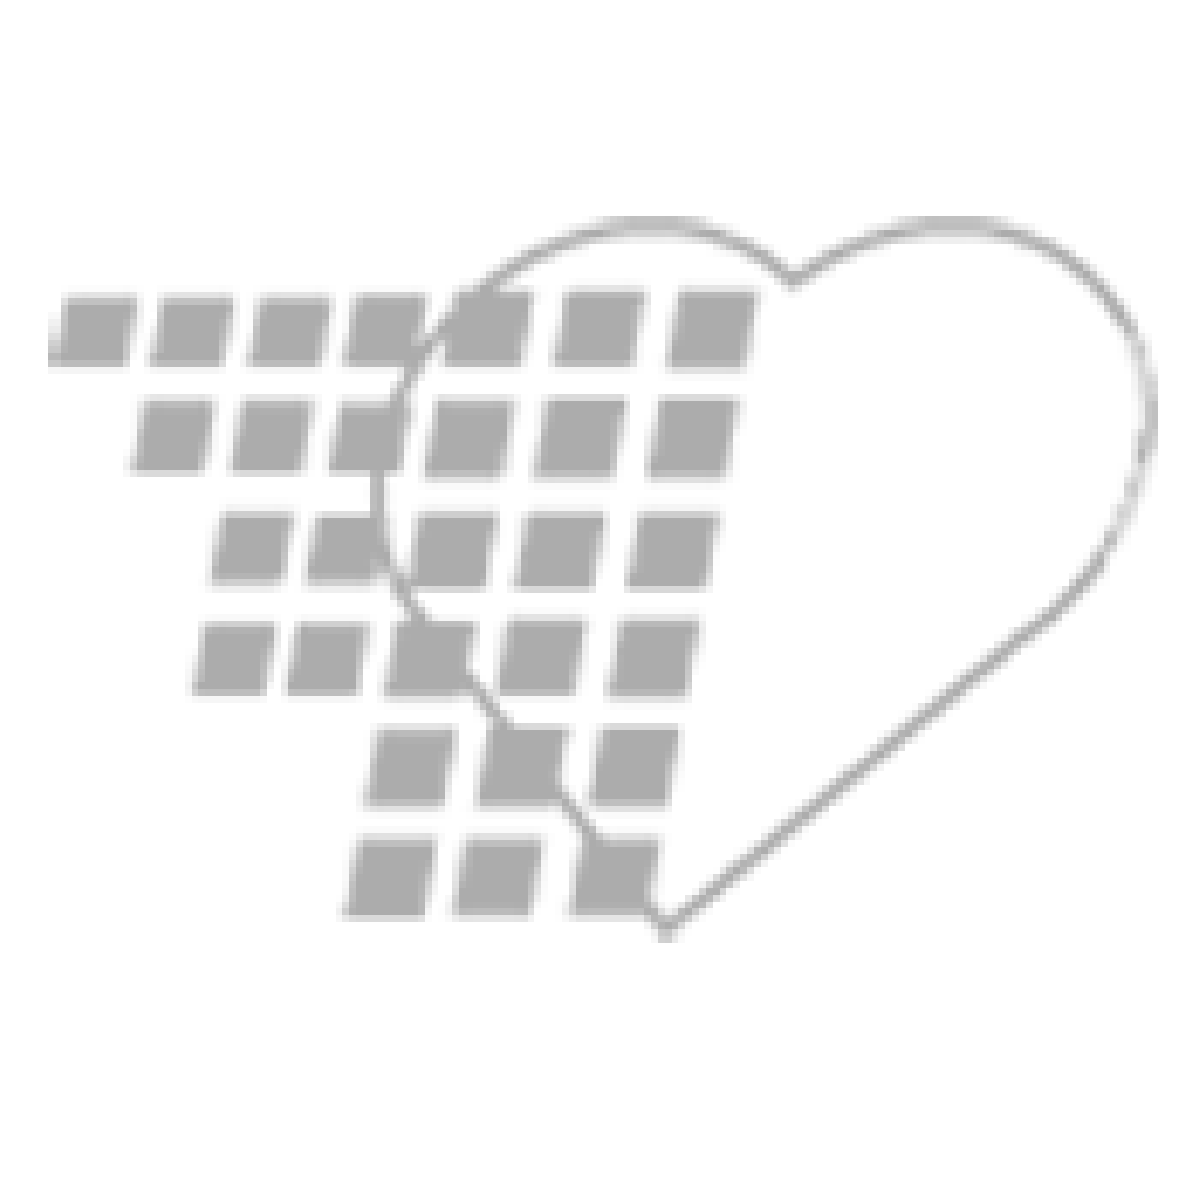 03-32-5019 - LYSOL® I.C    Disinfectant Spray - (ships ORMD)